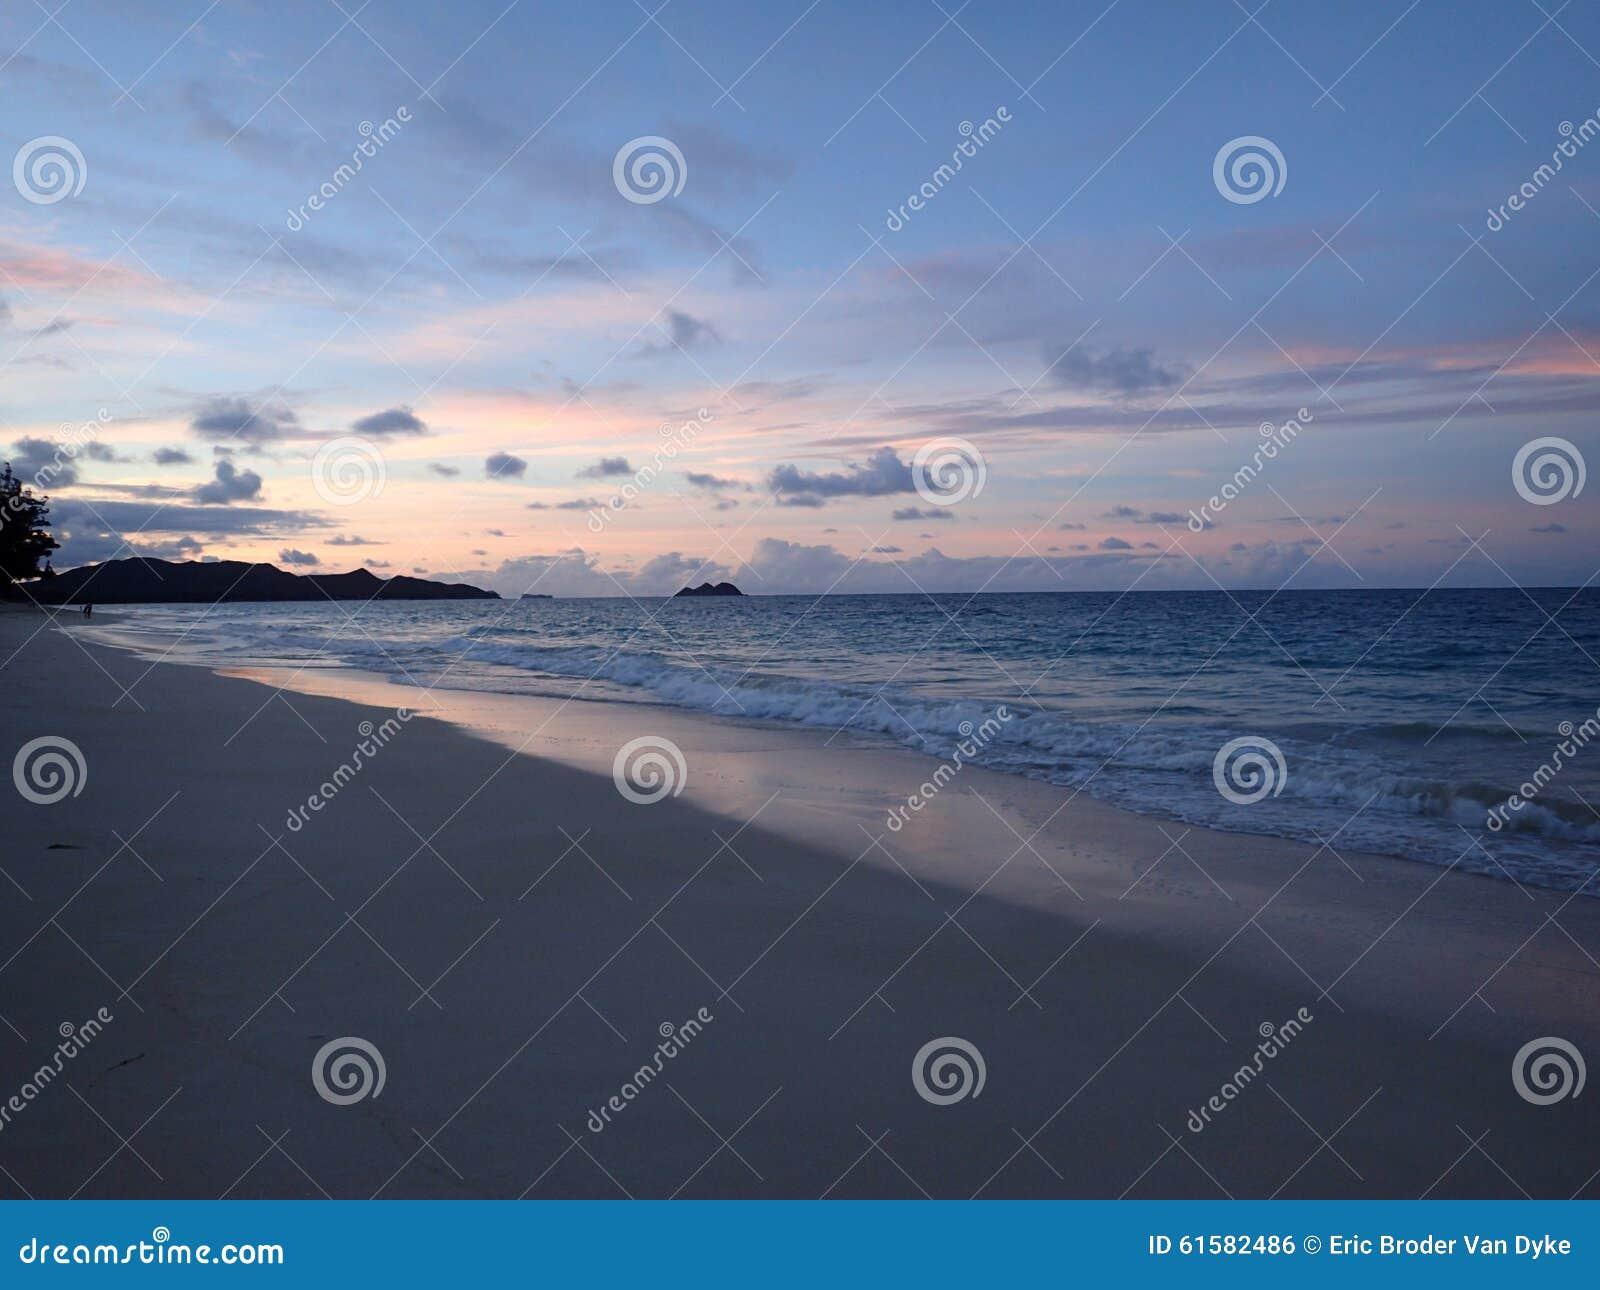 Waimanalo Beach looking towards Mokulua islands at dusk